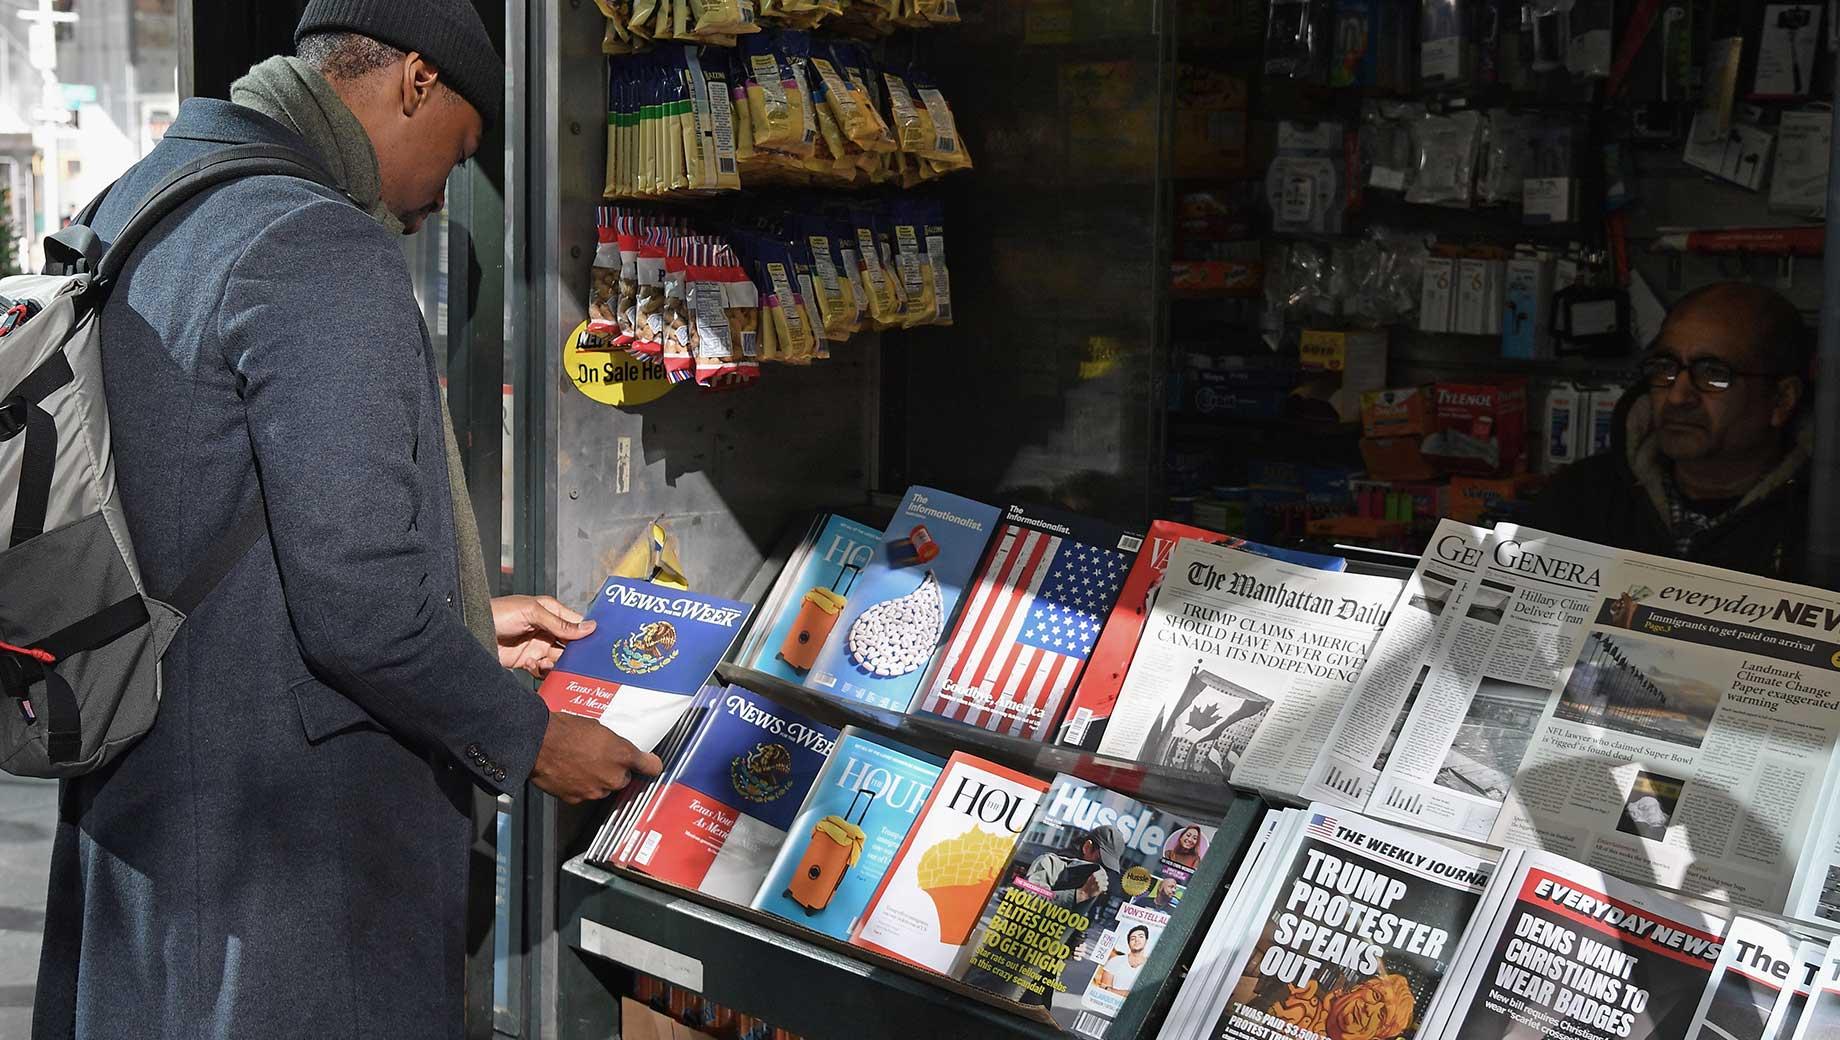 Americans Remain Distrustful of Mass Media